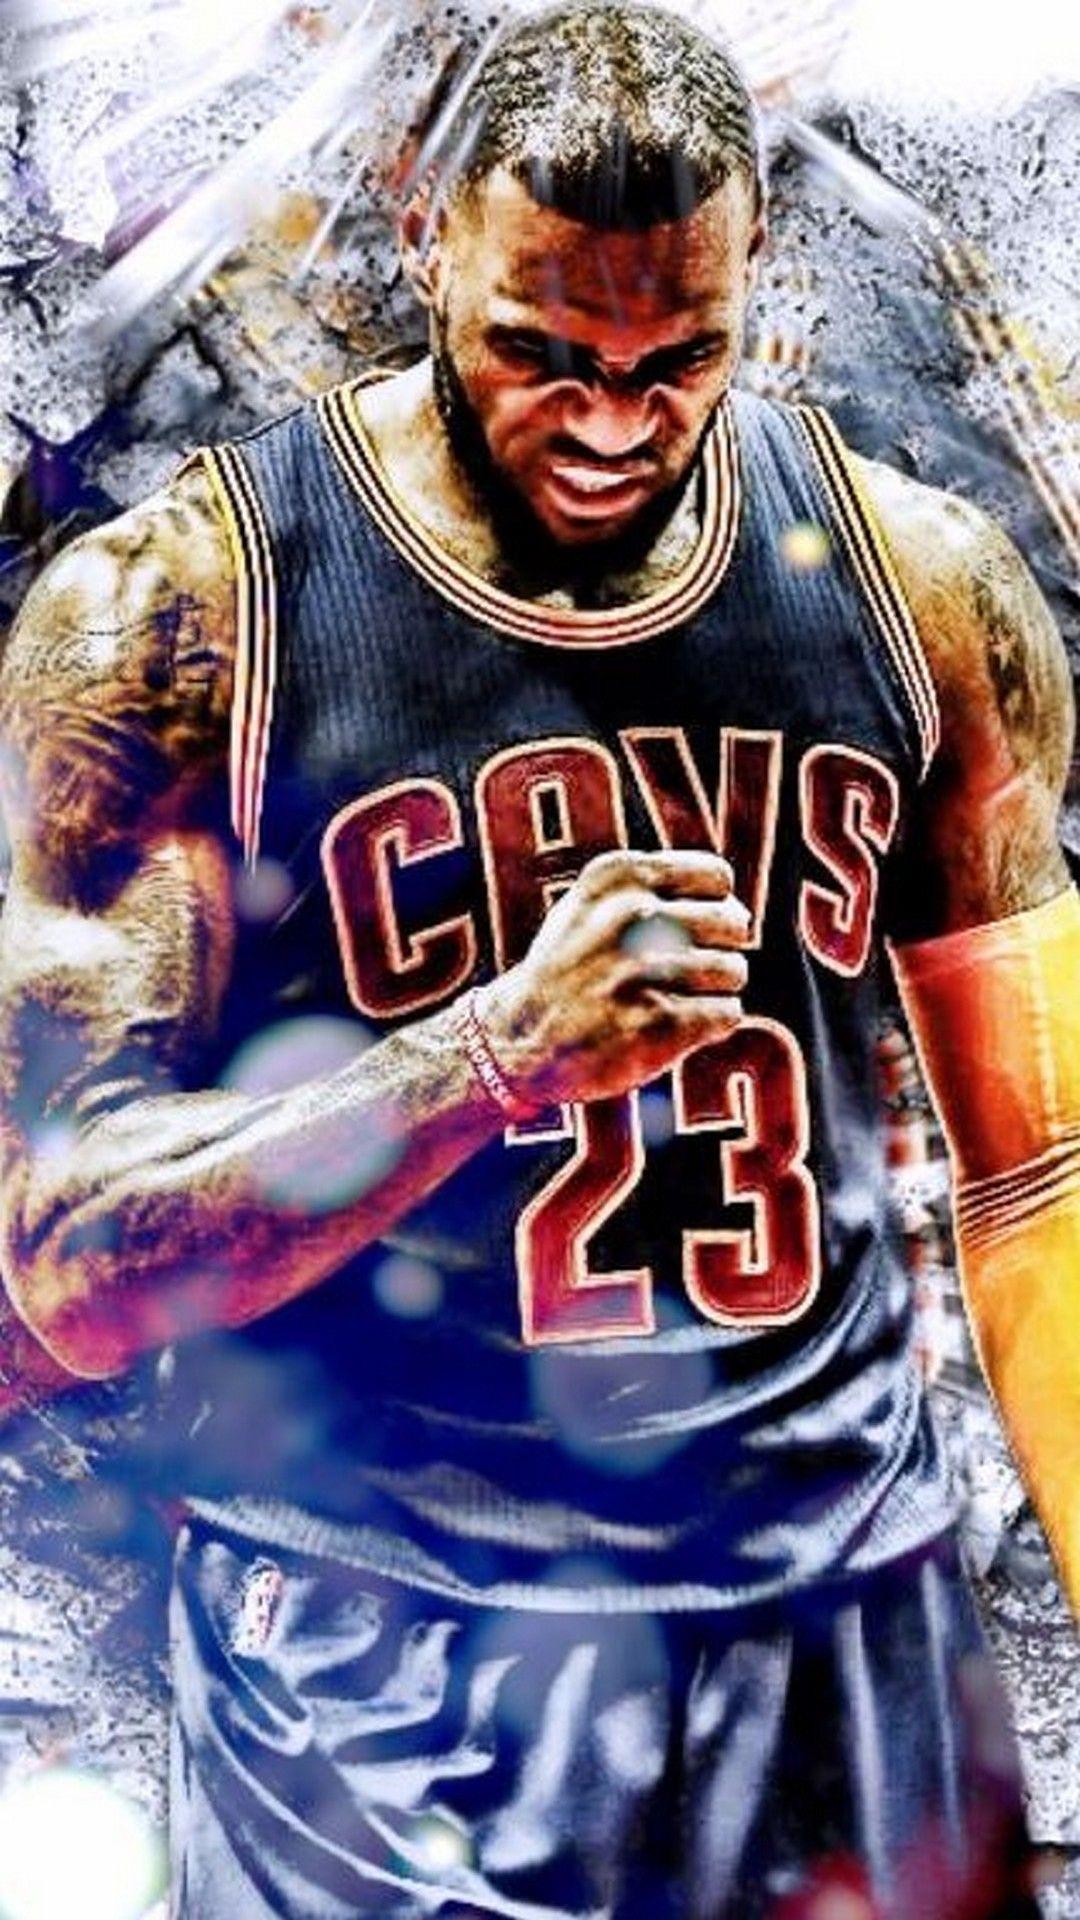 LeBron James Cavaliers IPhone Wallpaper